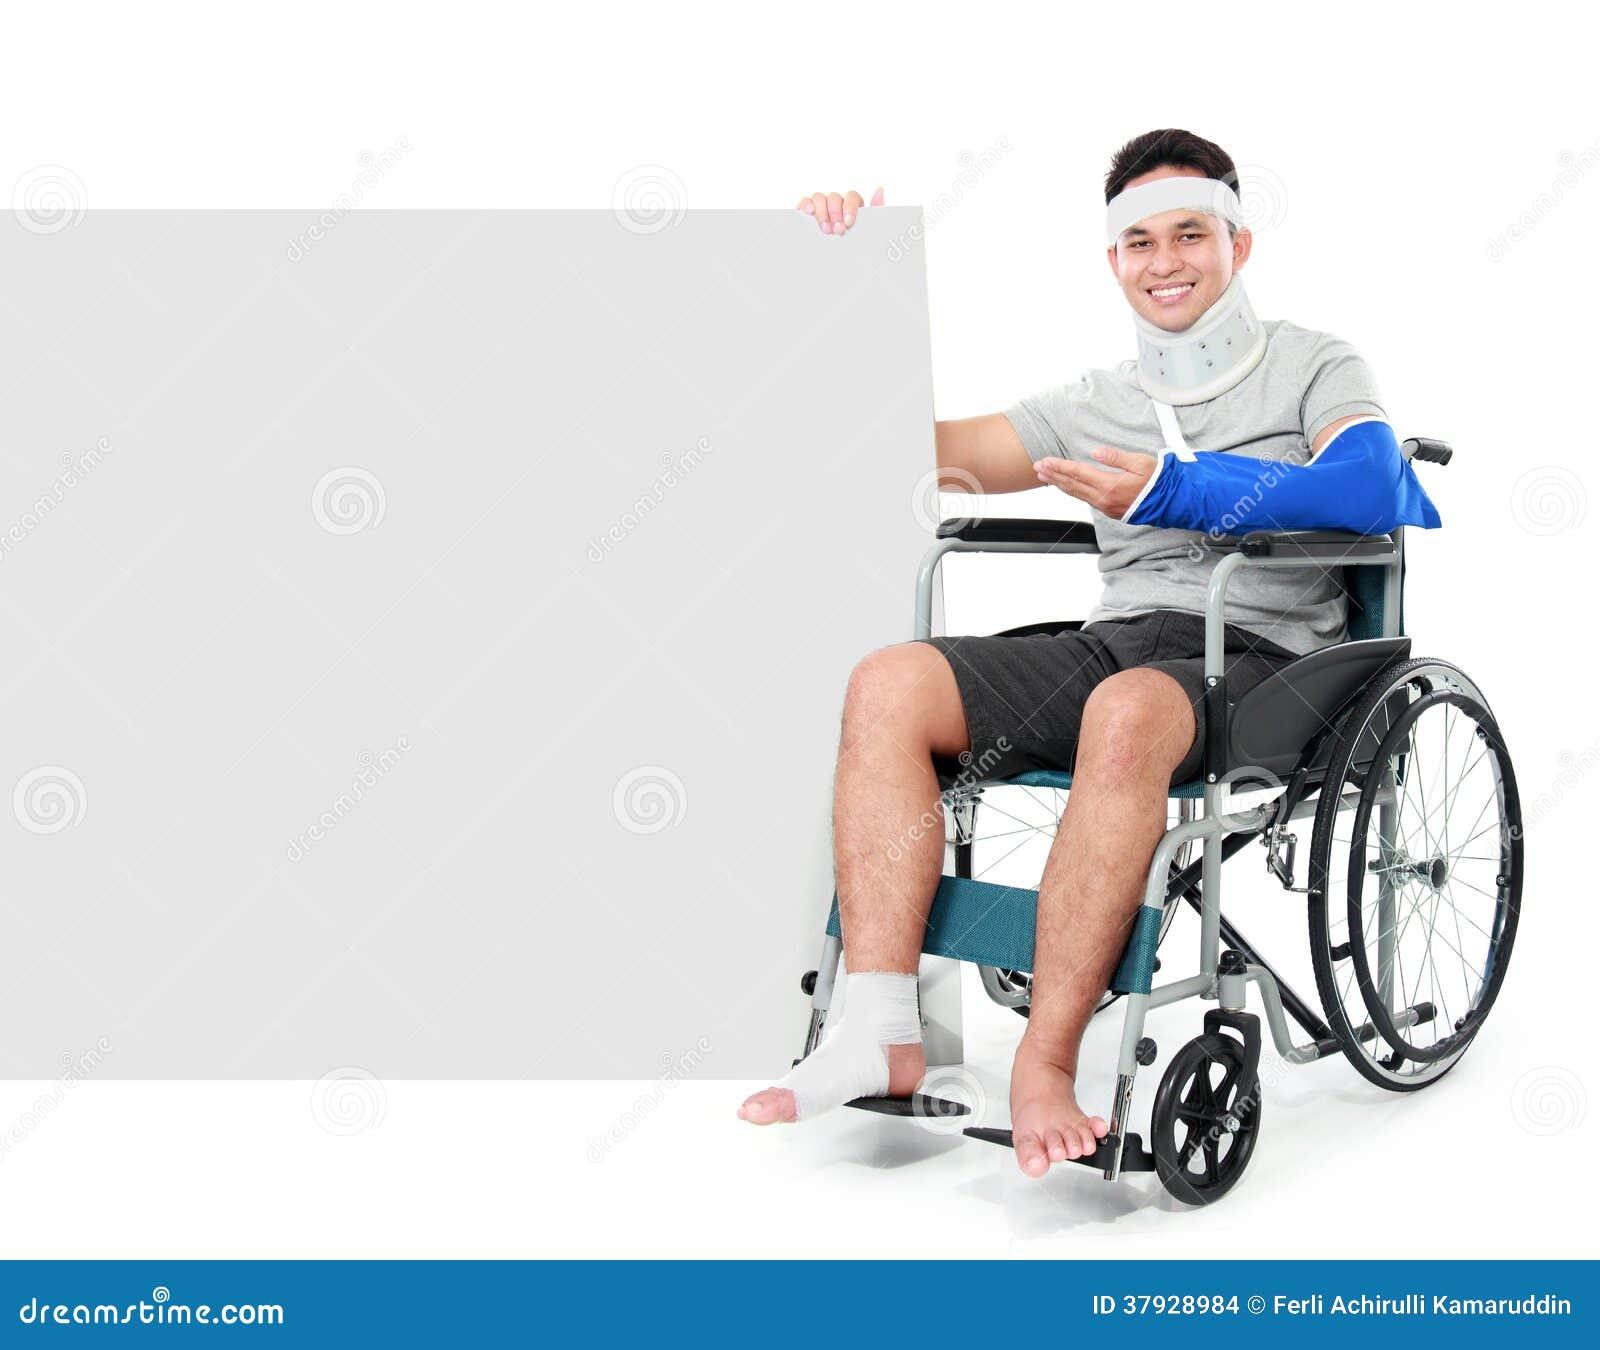 Мужчина при сломанная нога сидя на кресло-каталке с знаком